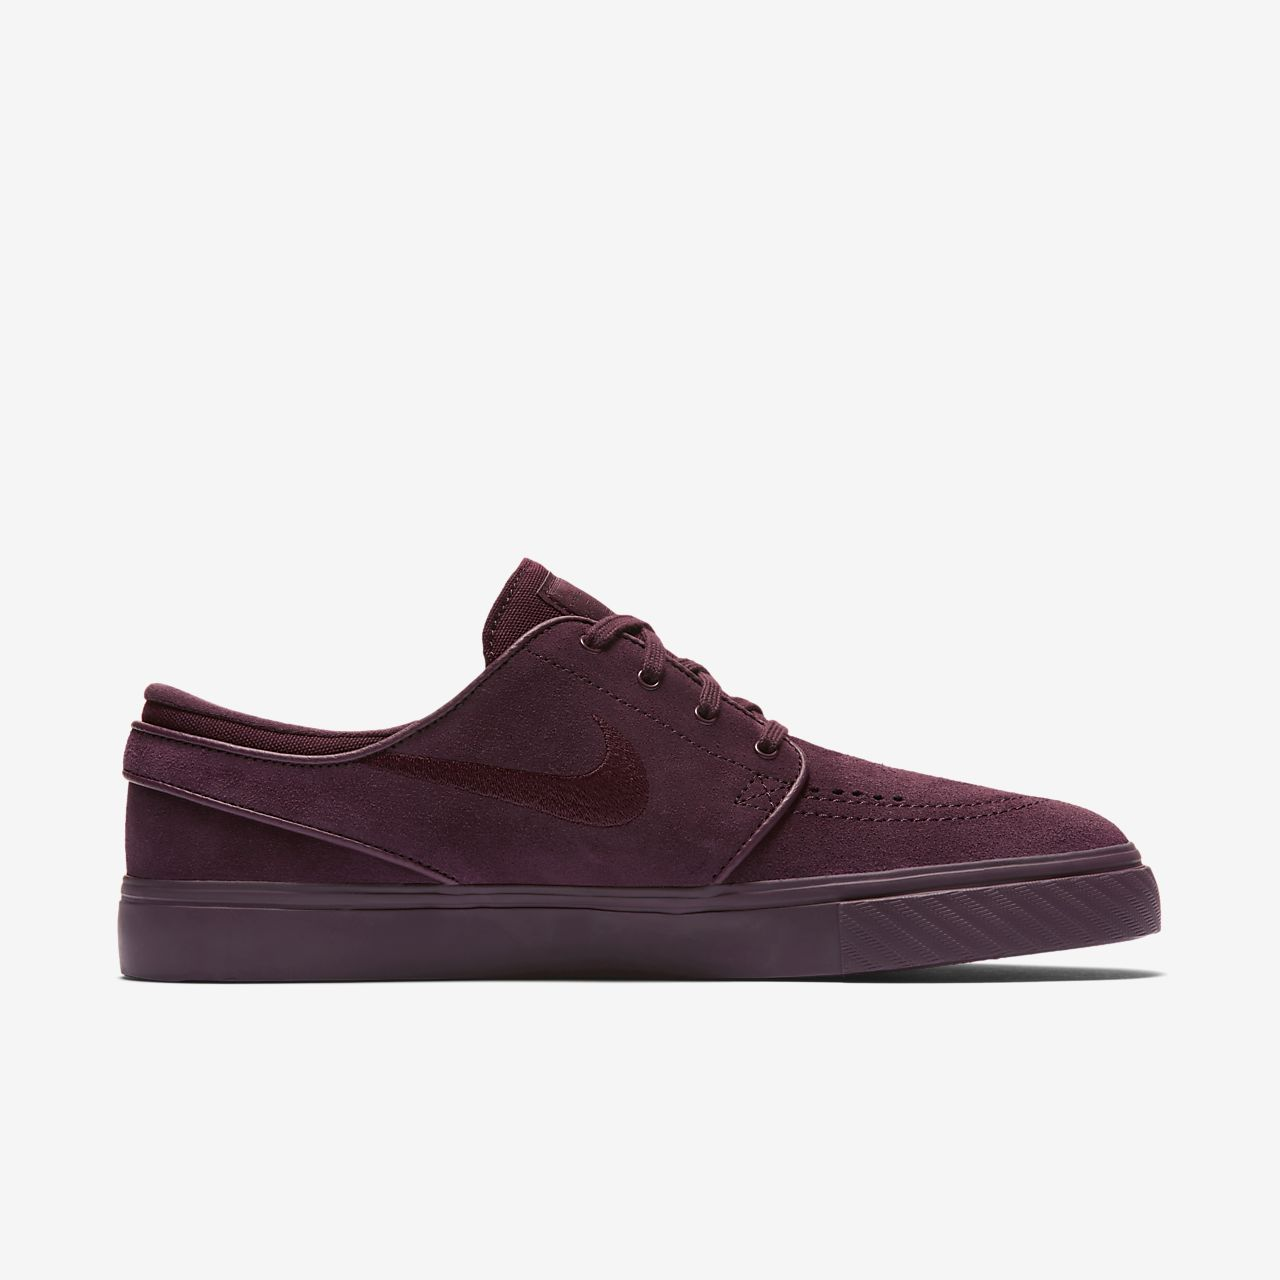 92c6919138 Nike Zoom Stefan Janoski Men's Skate Shoe